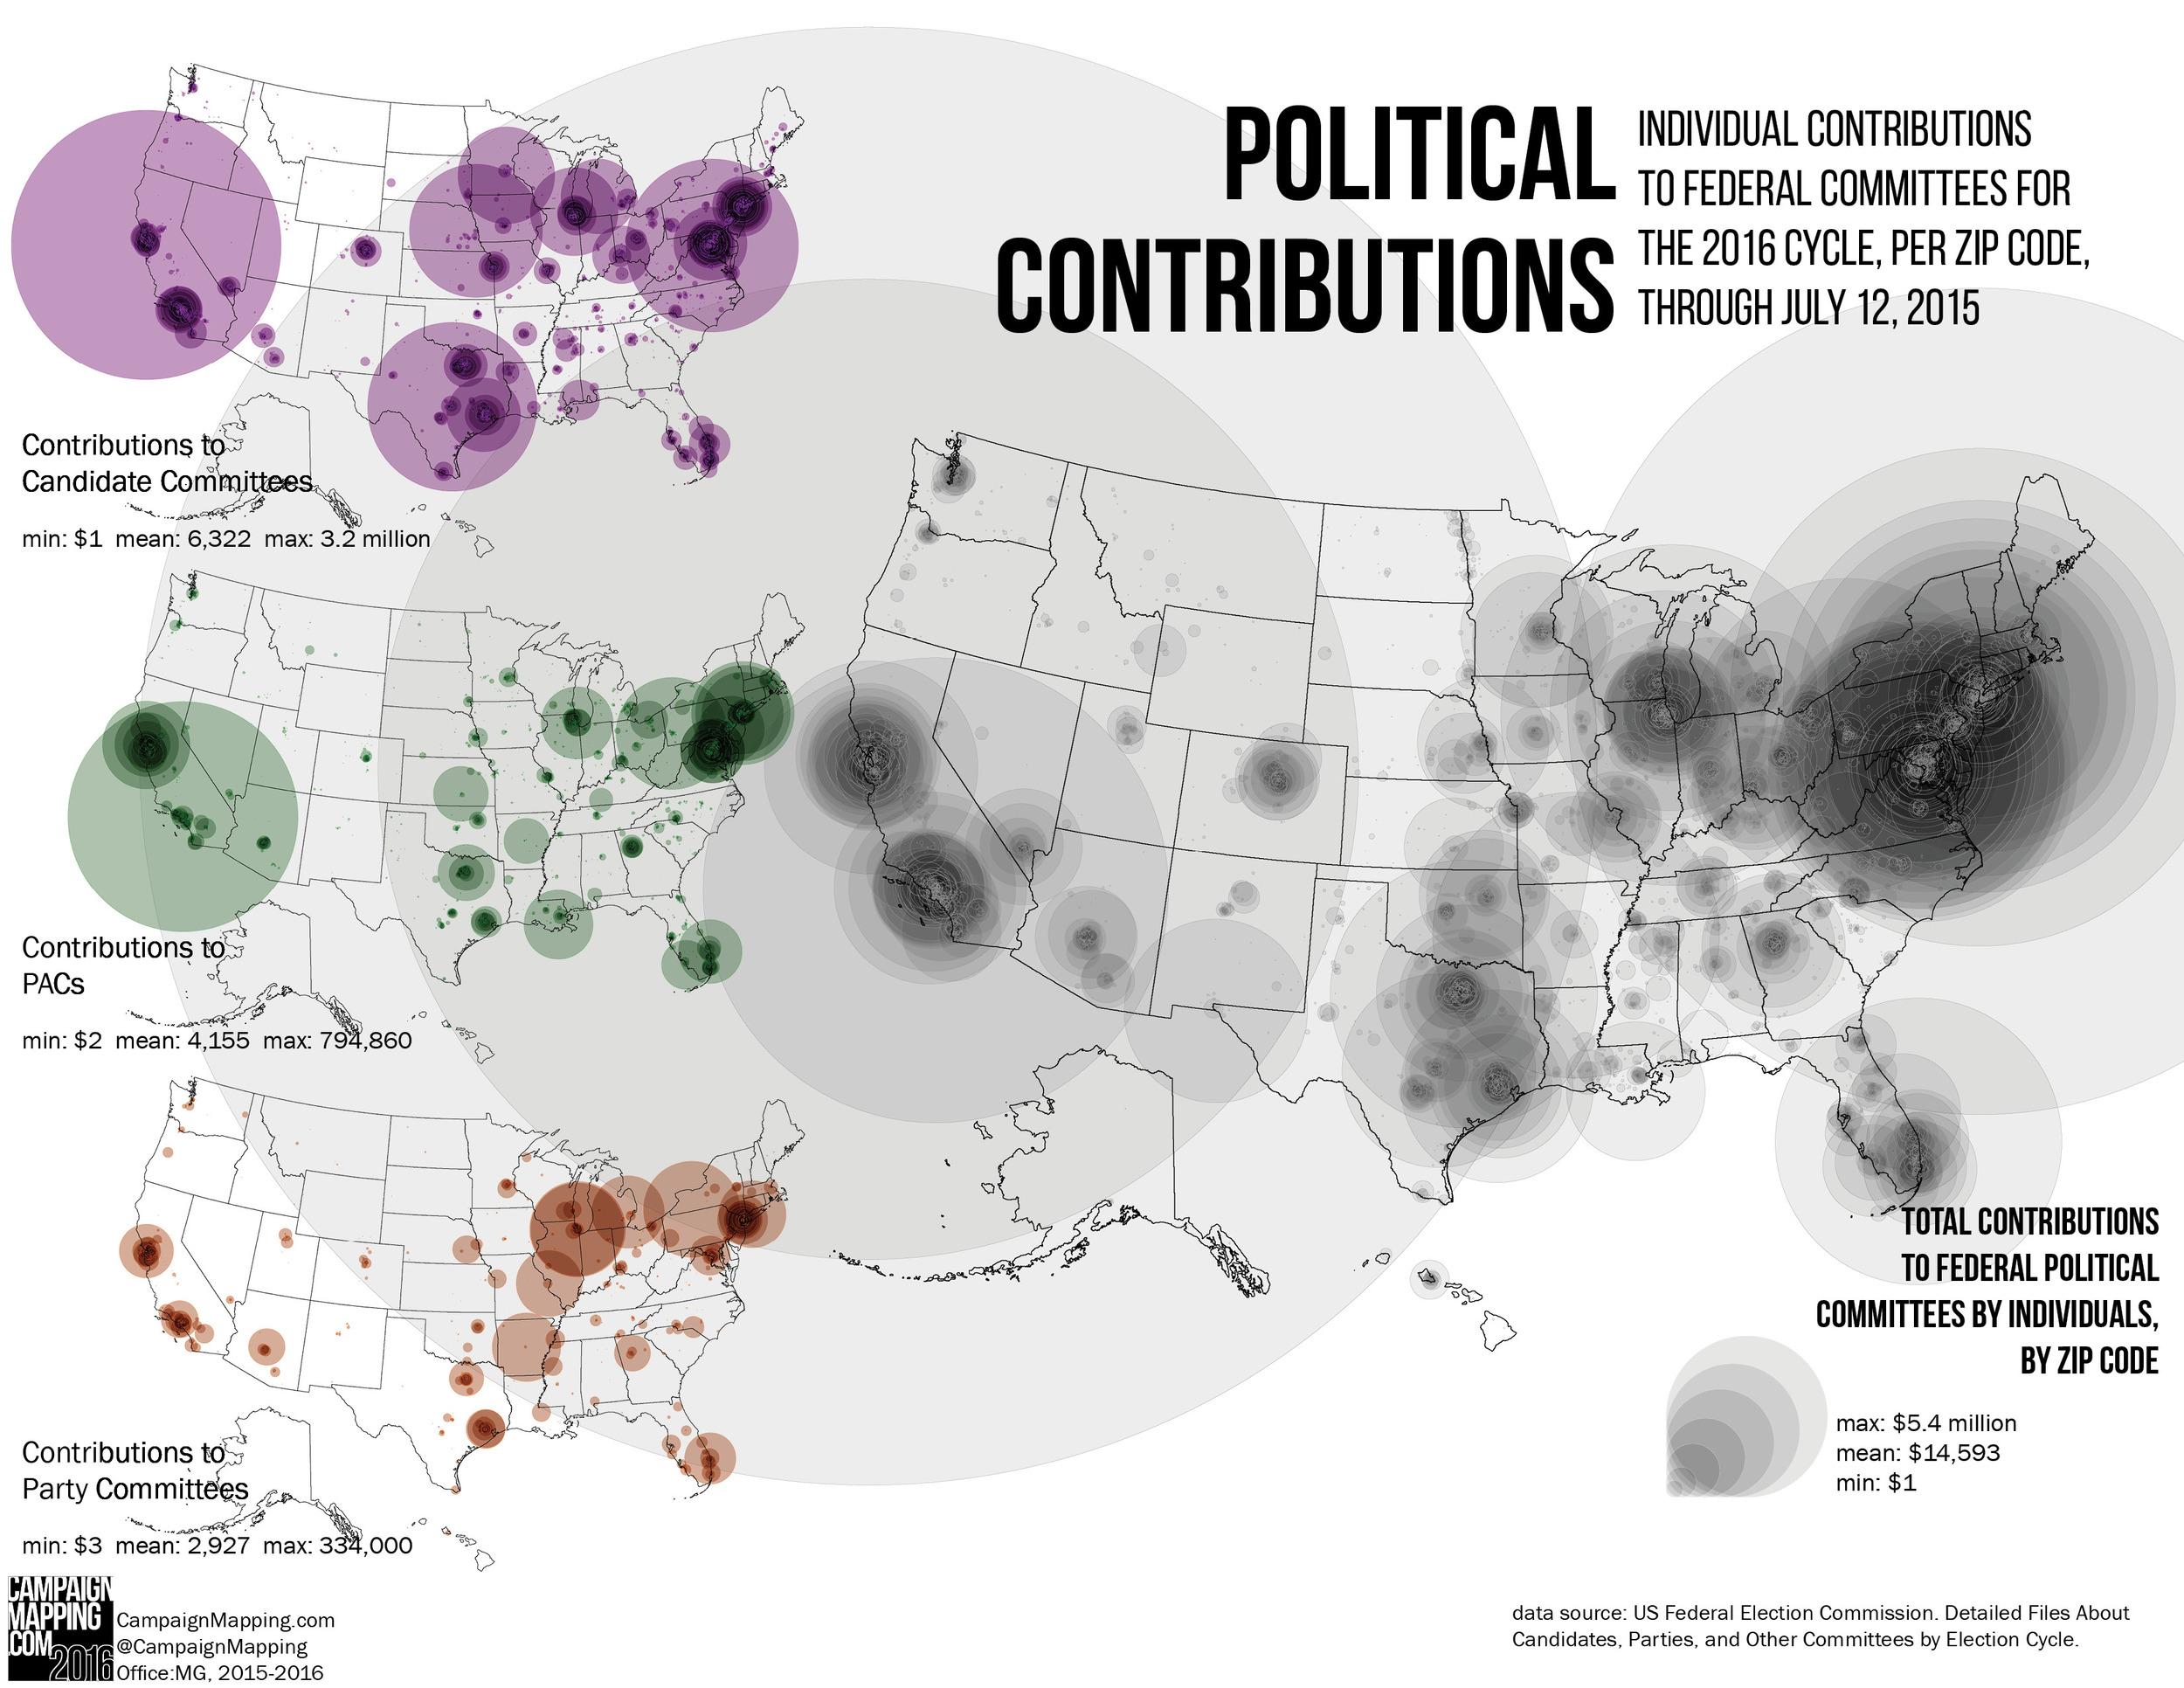 PoliticalContributions1.jpg